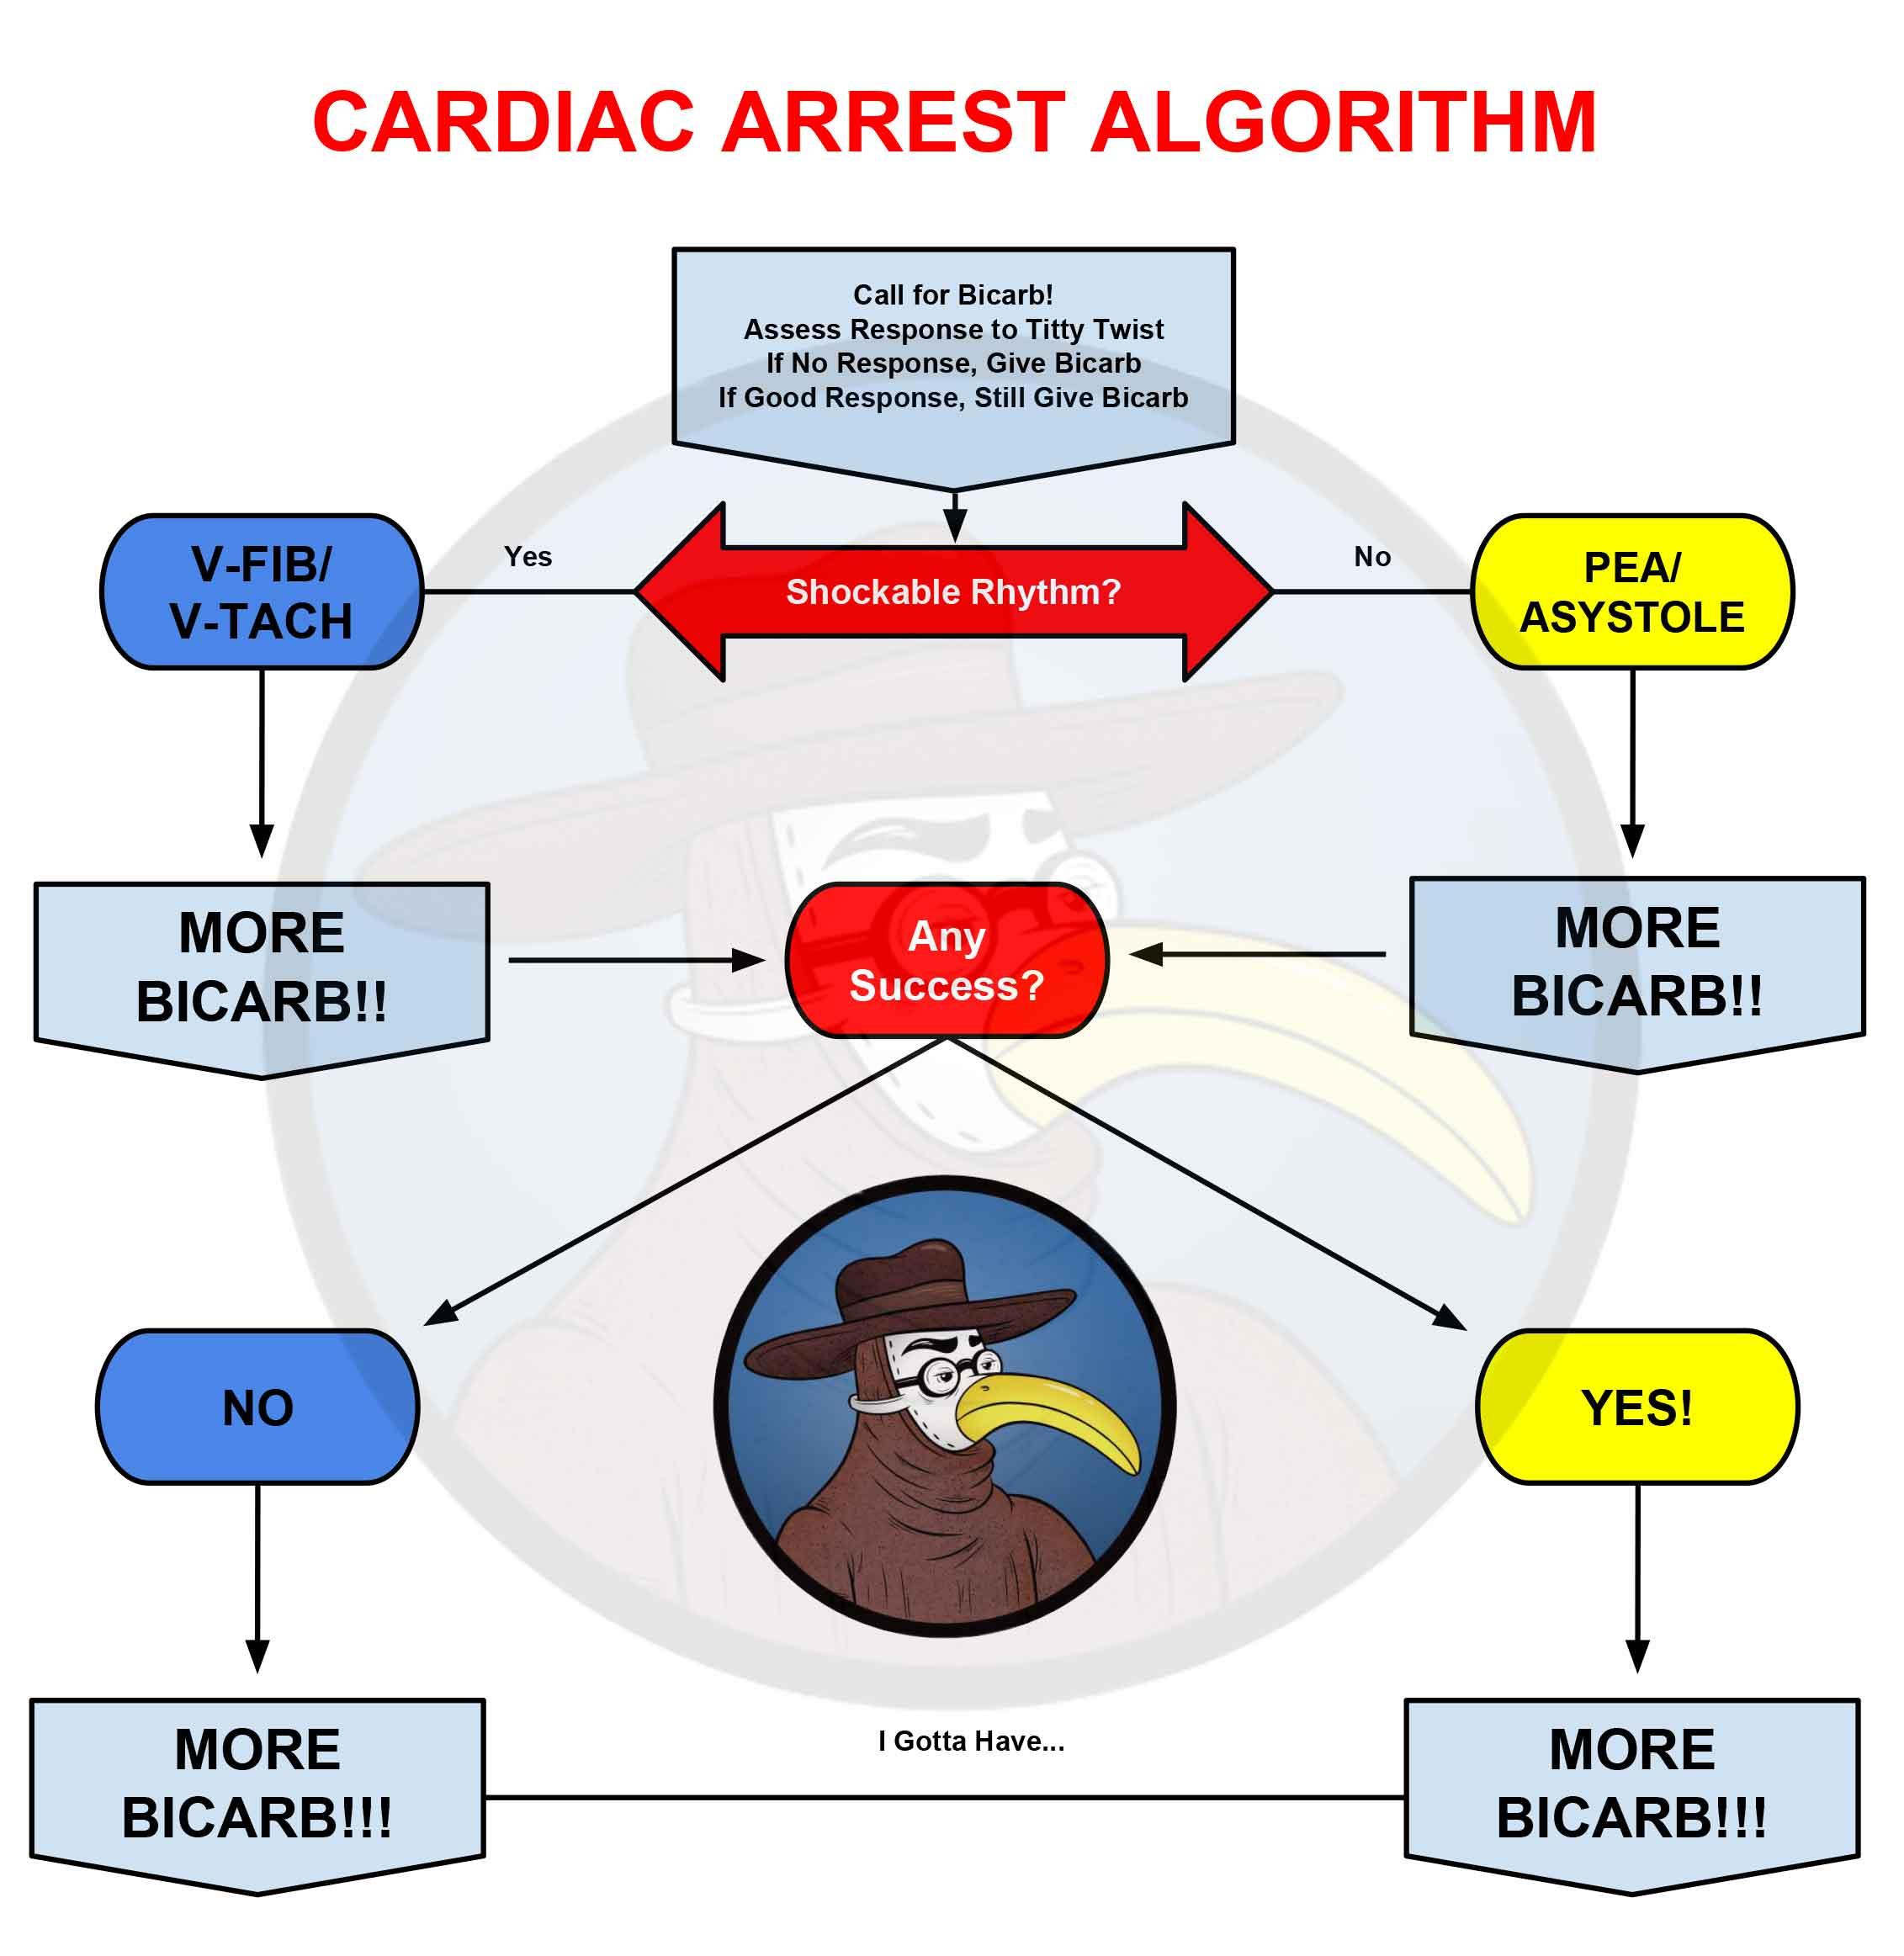 bicarb bicarb-only bicarbonate cardiac arrest CPR ACLS